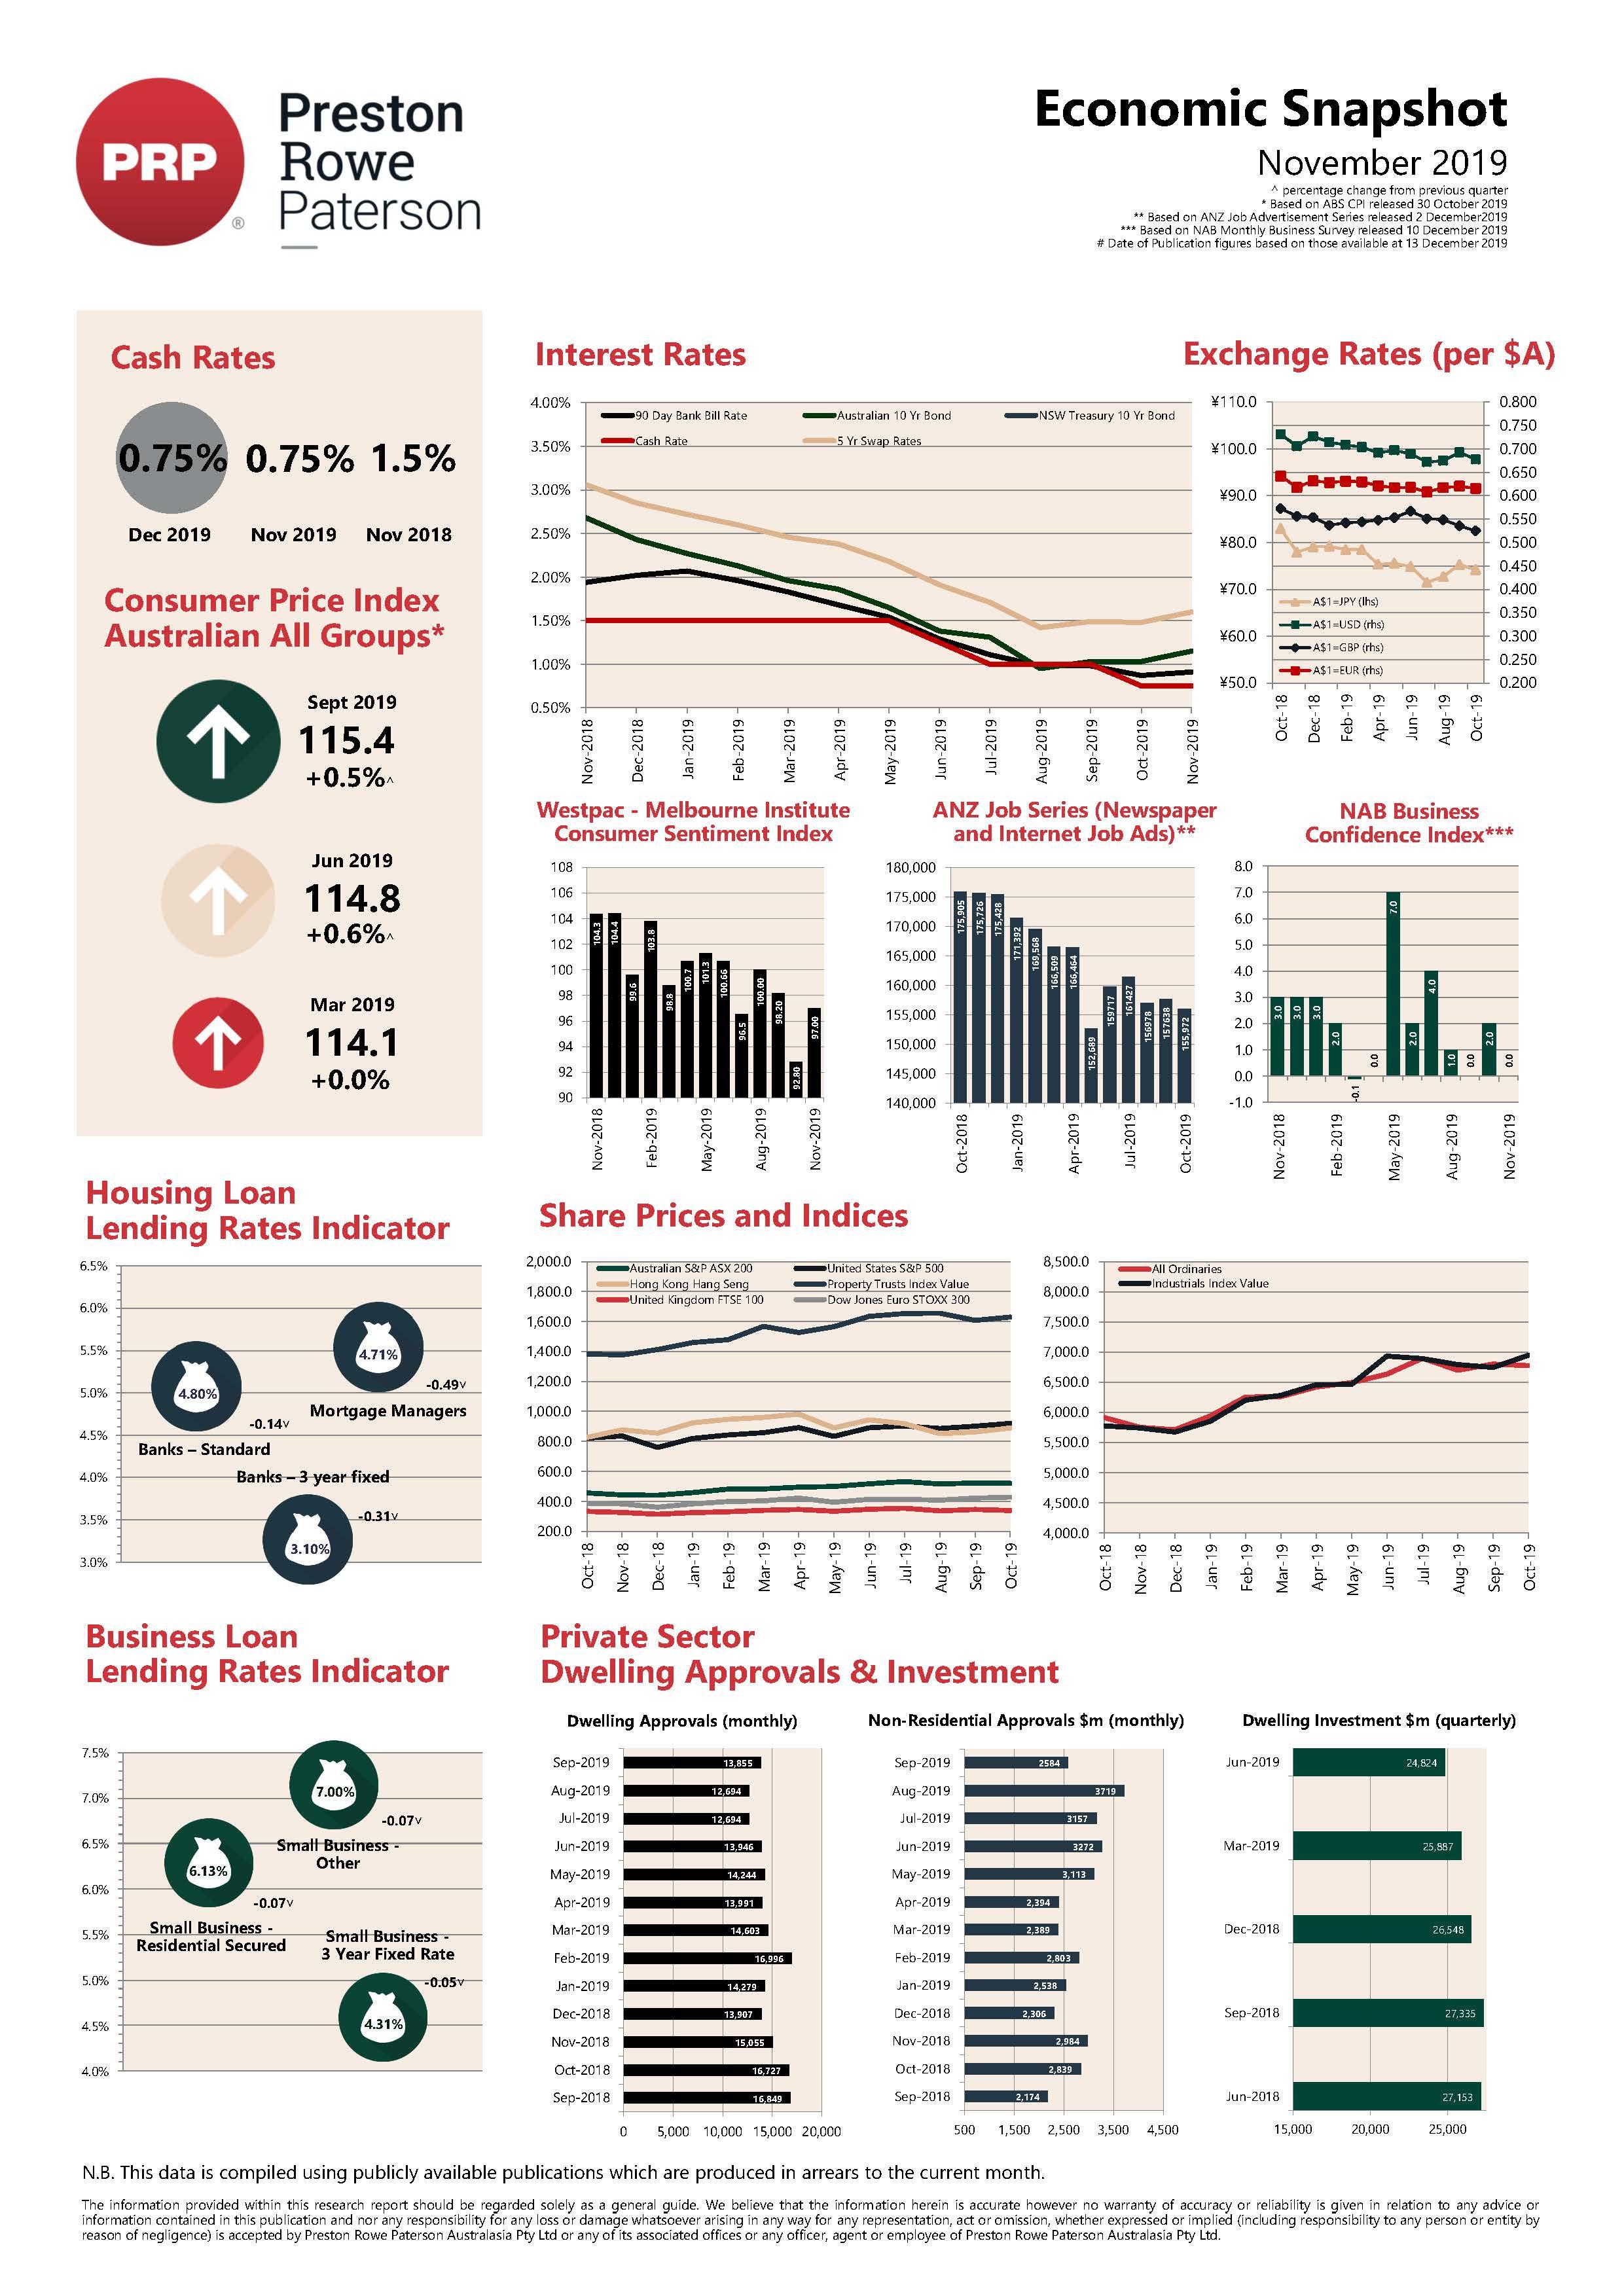 Economic Snapshot November 2019